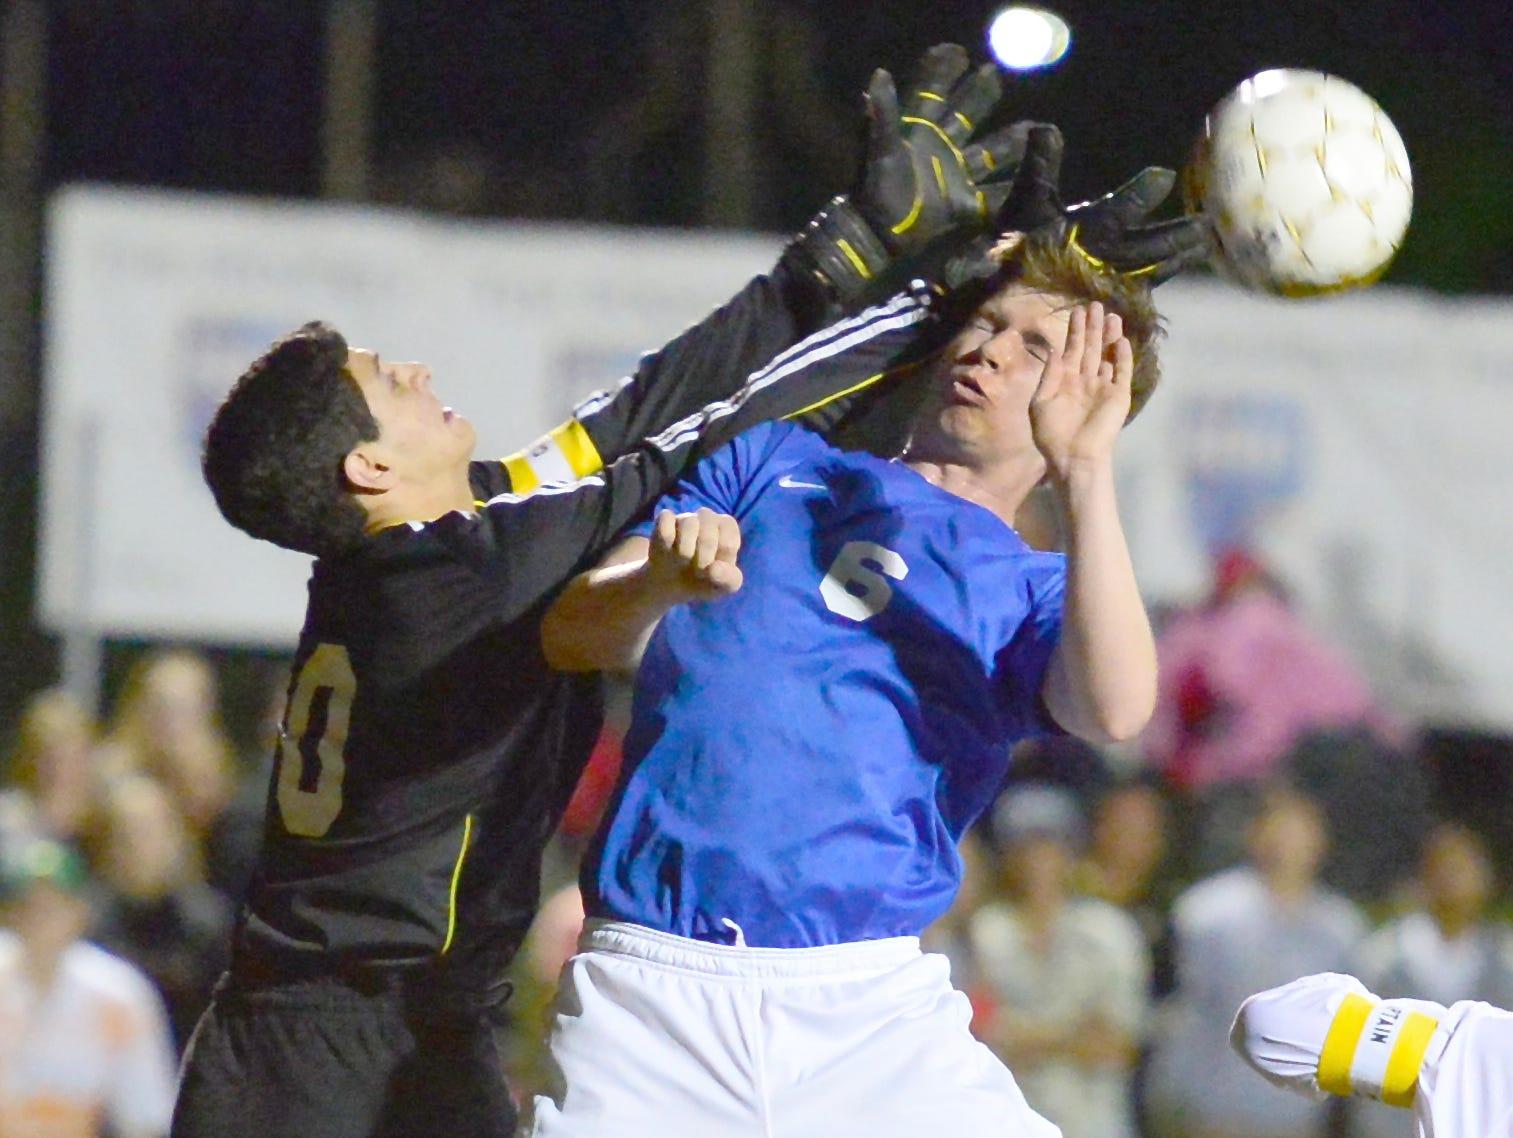 Merrol Hyde Magnet senior goalkeeper Nicholas Goldberg makes a save as he collides with White House junior forward Josh Dunlap during second-half action.